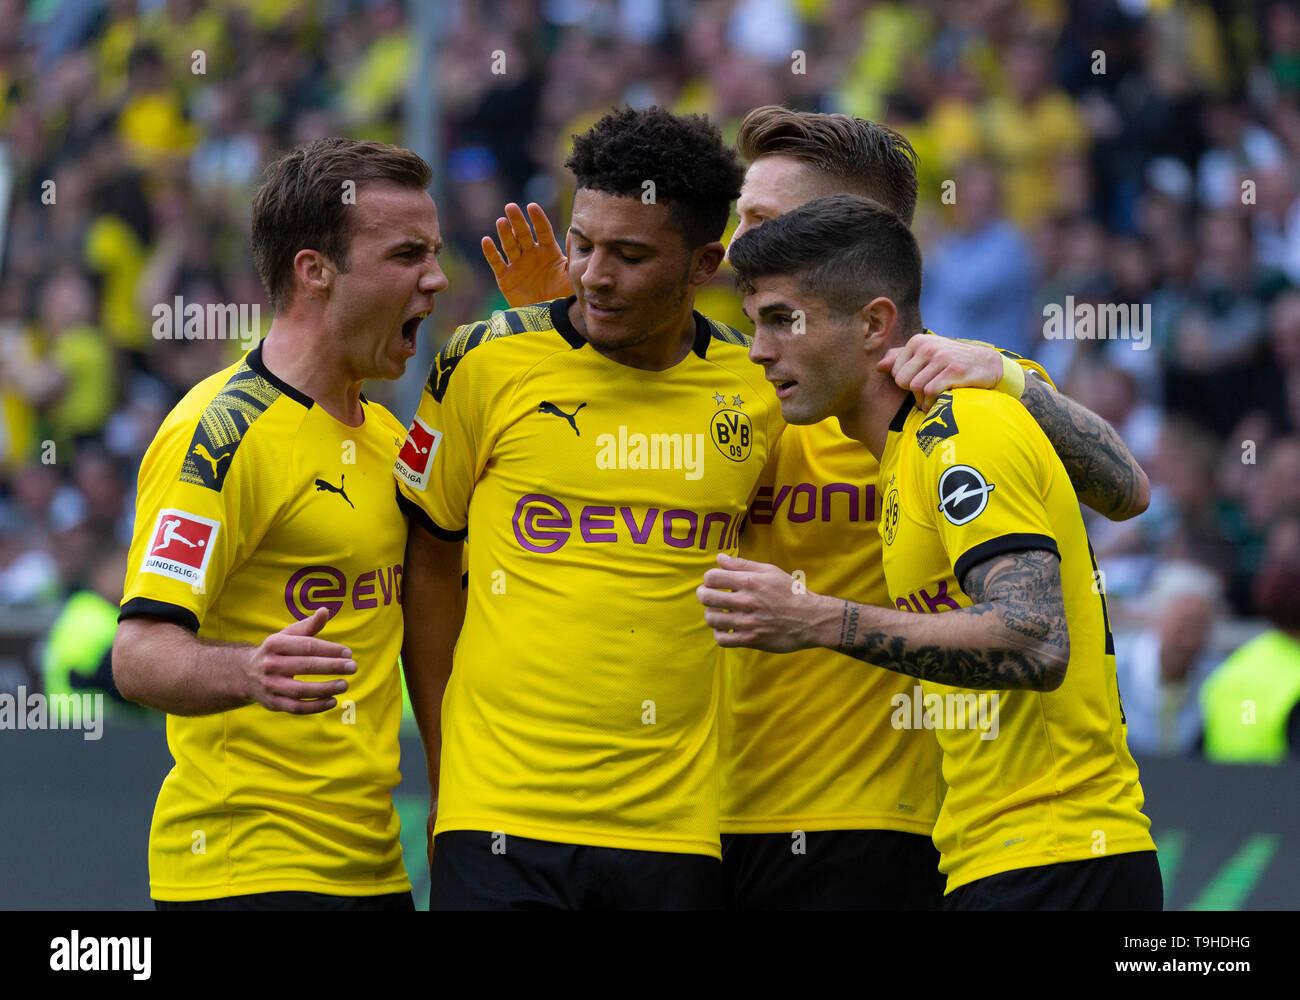 Sport, Fussball, Bundesliga, 2018/2019, Borussia Moenchengladbach vs. BVB Borussia Dortmund 0-2, Stadion Borussia-Park, Torjubel nach dem 0-2, v.l.n.r. Mario Goetze (BVB), Jadon Malik Sancho (BVB), Torschuetze Marco Reus (BVB) verdeckt, Christian Pulisic (BVB), DFL REGULATIONS PROHIBIT ANY USE OF PHOTOGRAPHS AS IMAGE SEQUENCES AND/OR QUASI-VIDEO, sports, football, Bundesliga, 2018/2019, Borussia Moenchengladbach vs. BVB Borussia Dortmund 0-2, Stadium Borussia Park, rejoicing at the 0-2 goal, f.l.t.r. Mario Goetze (BVB), Jadon Malik Sancho (BVB), goal scorer Marco Reus (BVB) covered, Christian  - Stock Image